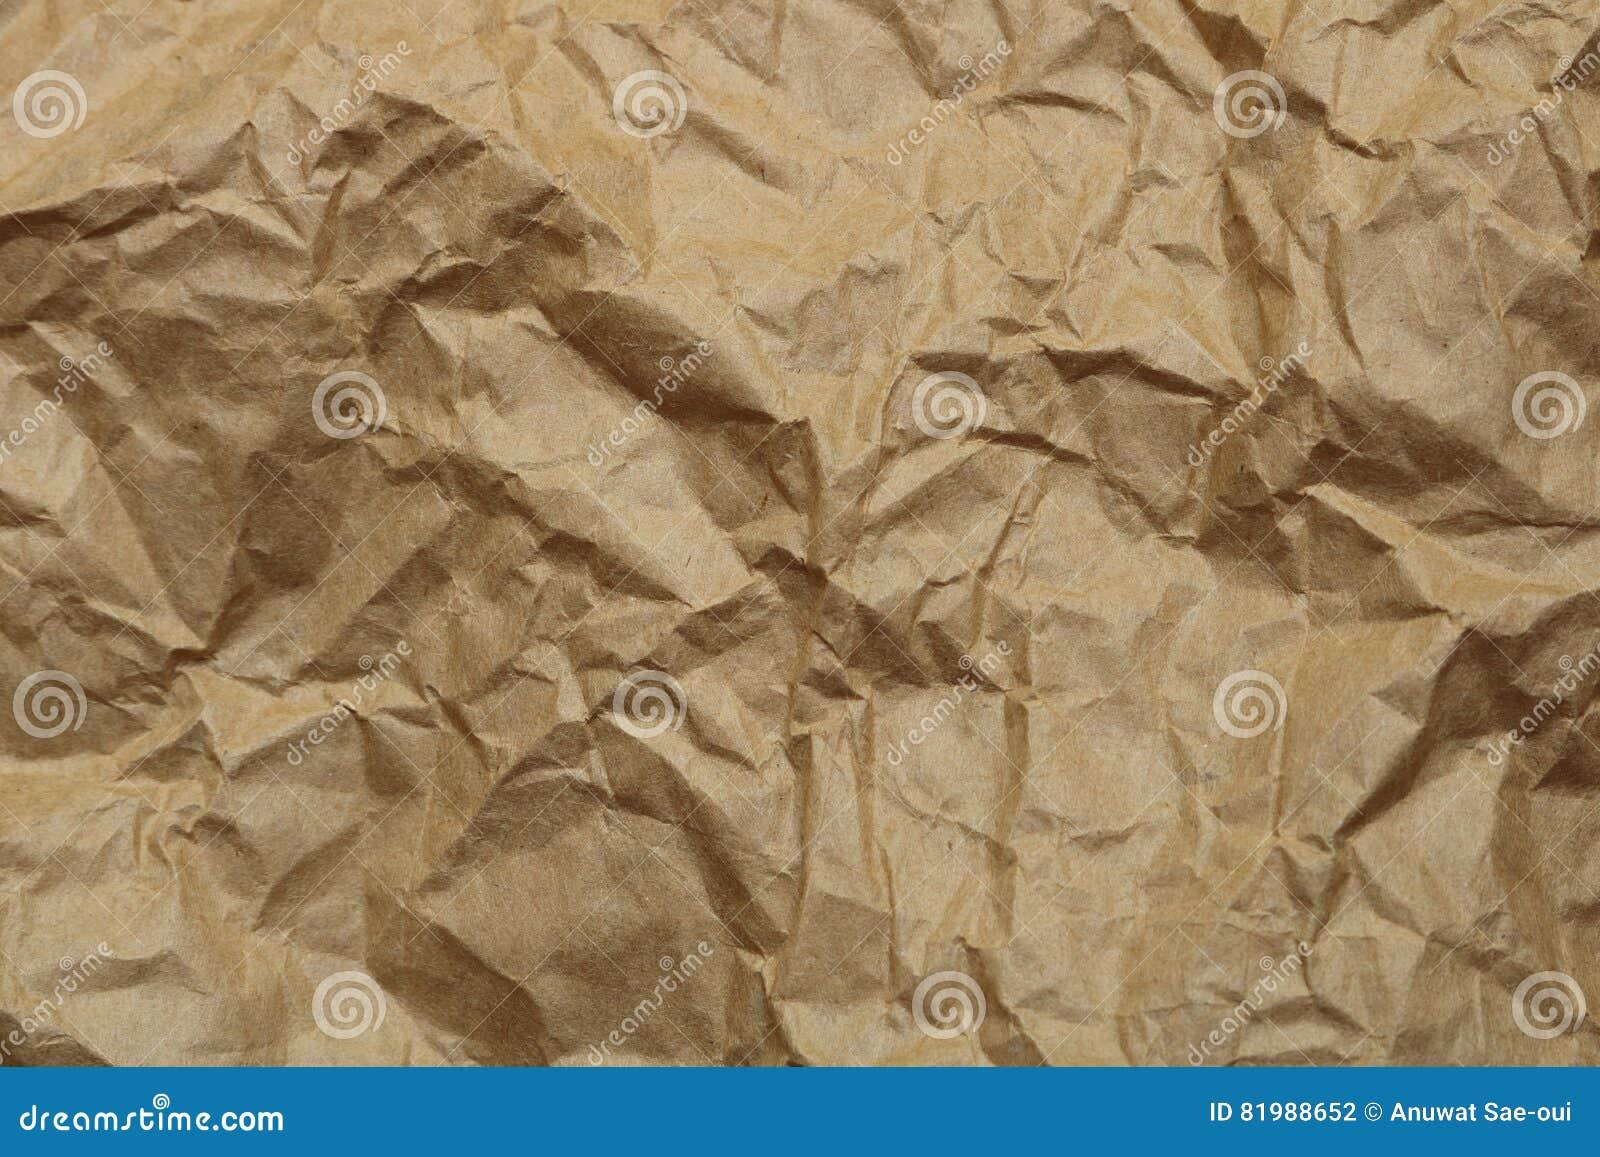 Brown crumpled paper texture